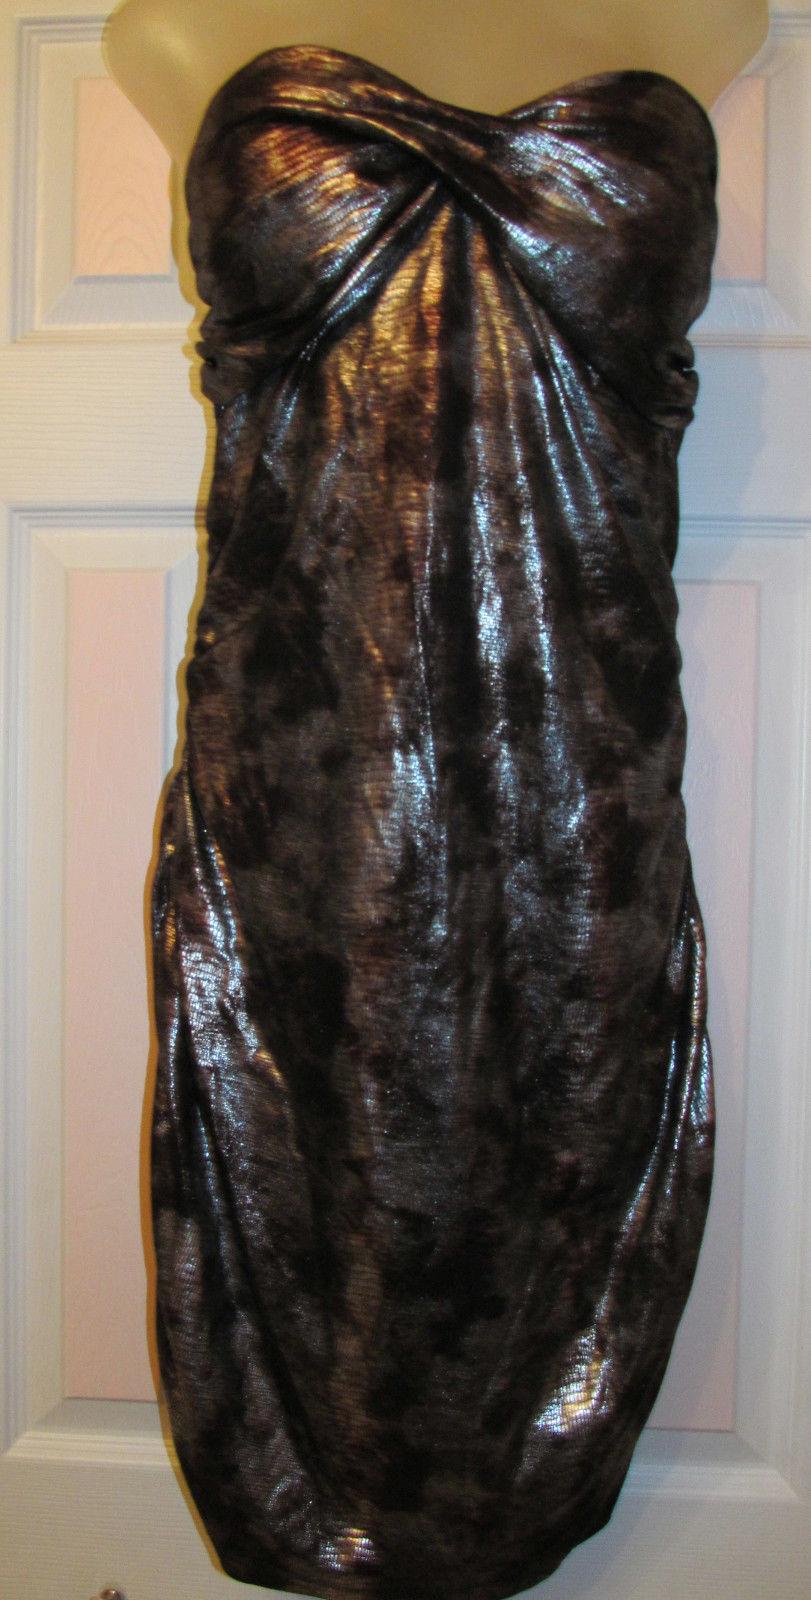 210e1ff01854 BEBE TWIST FRONT METALLIC SNAKE ANIMAL EMBOSSED PRINT gold metallic dress L  NWT